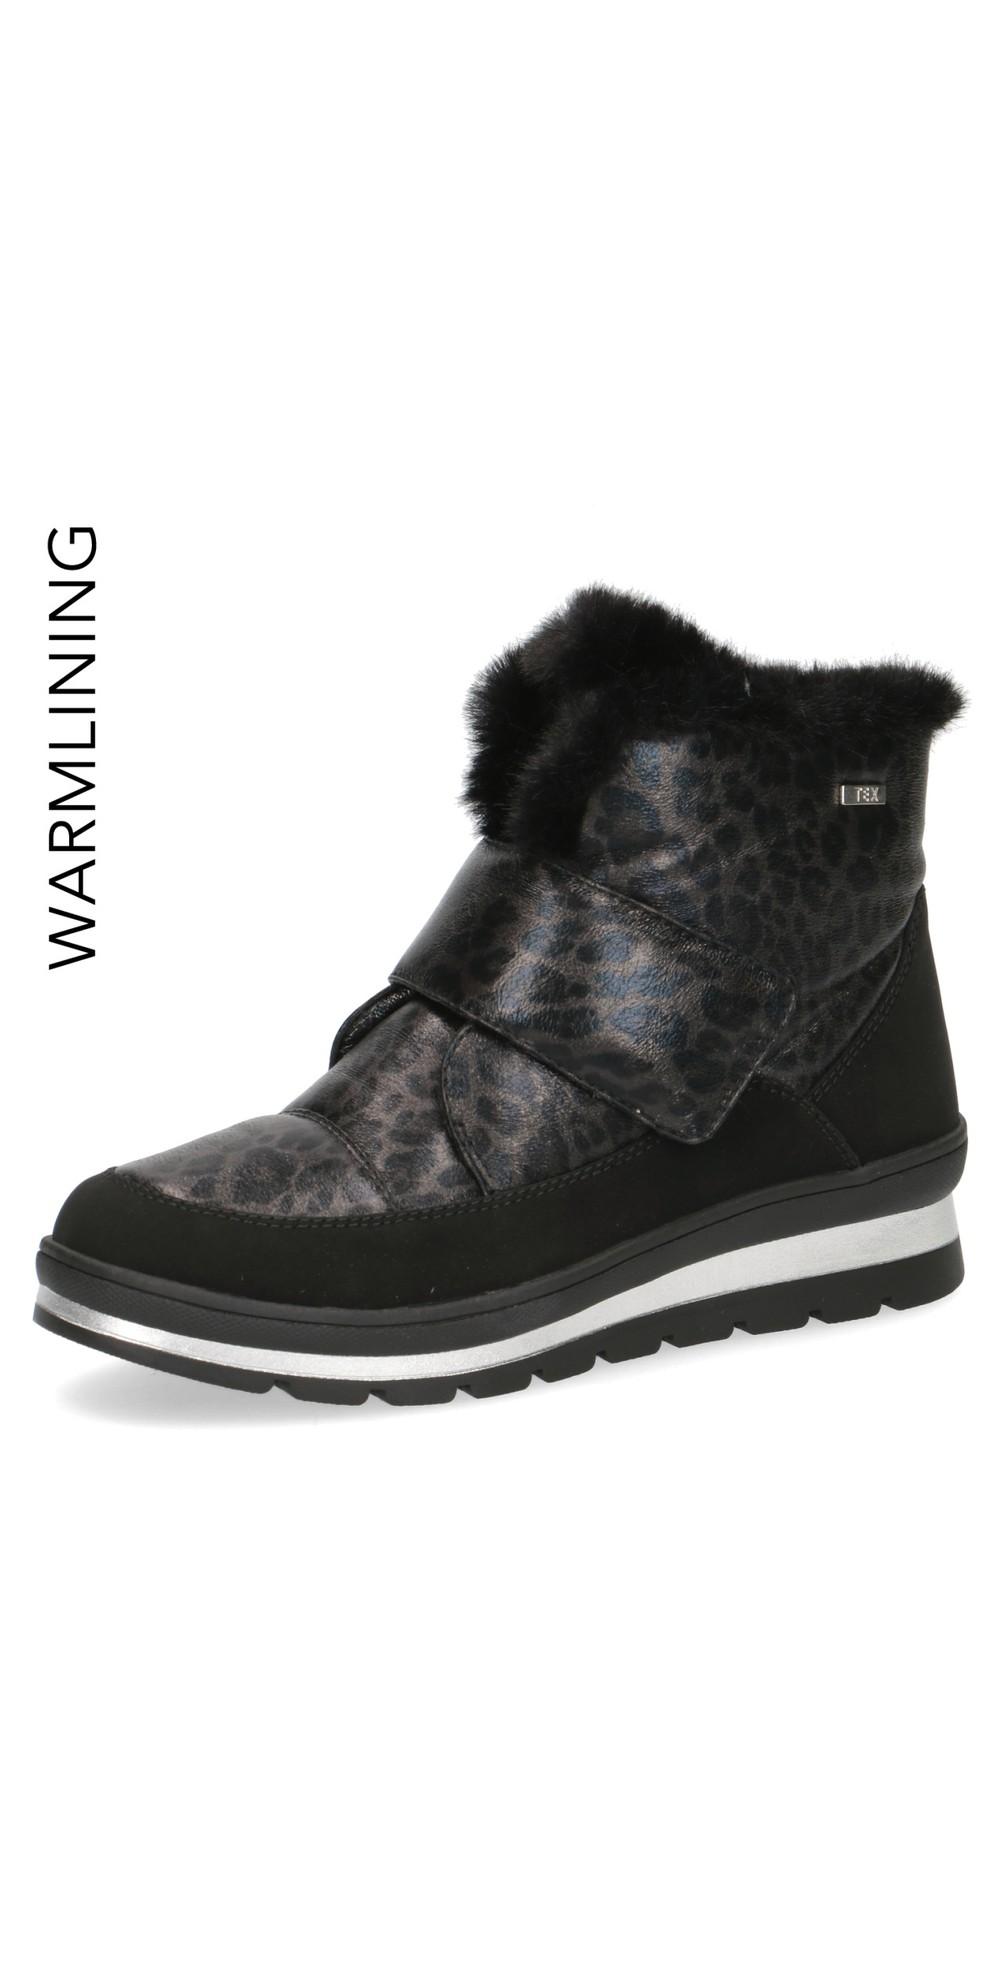 Greta All Weather Nordic Boot main image